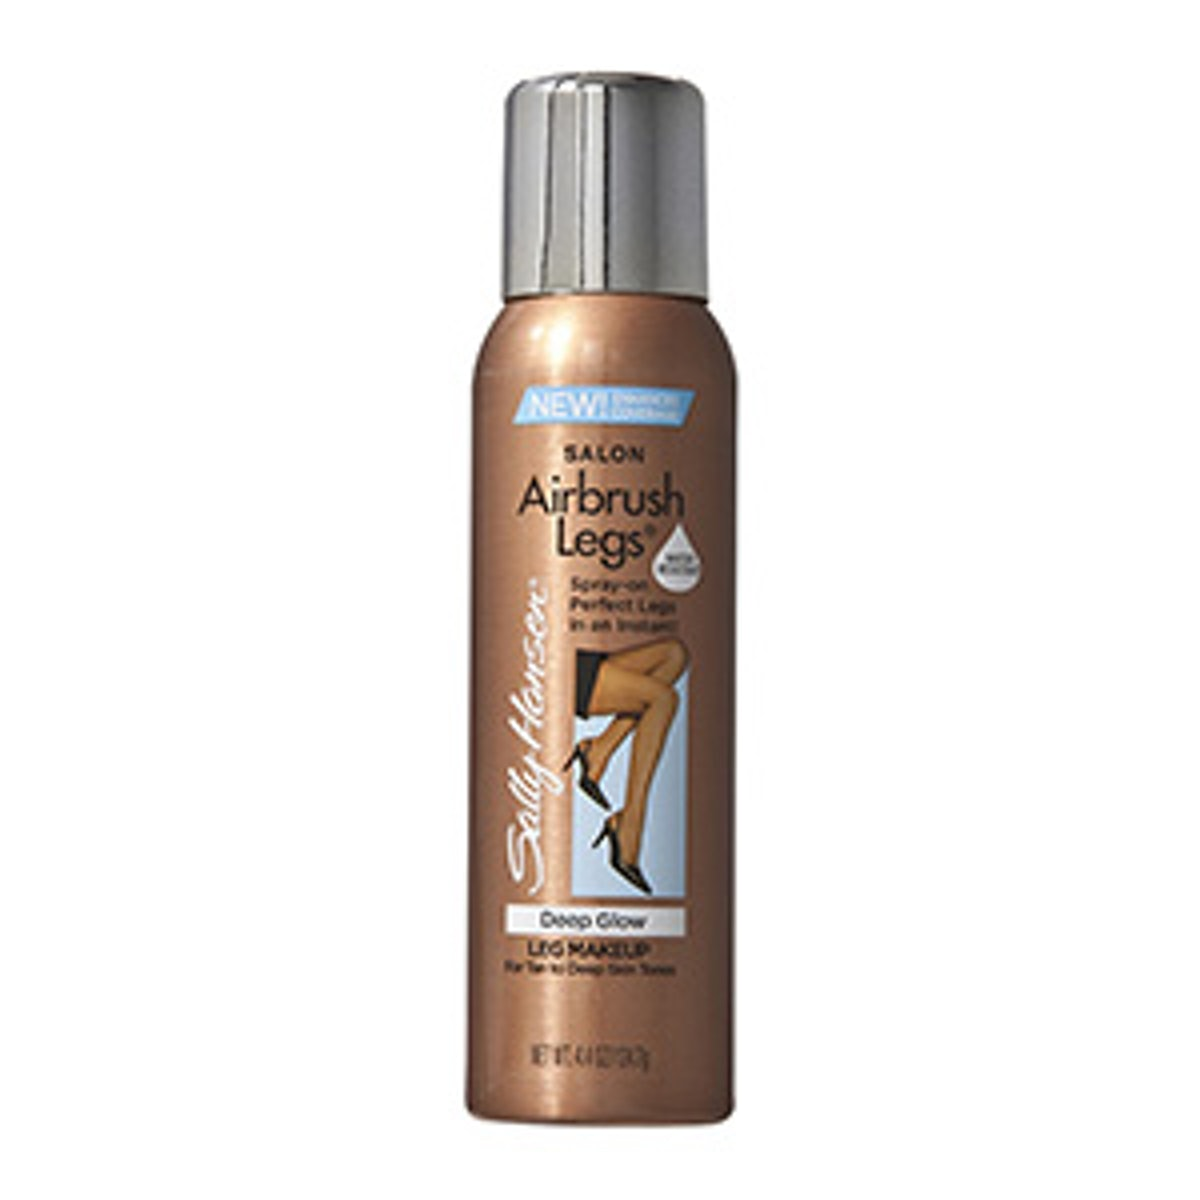 Airbrush Legs Spray